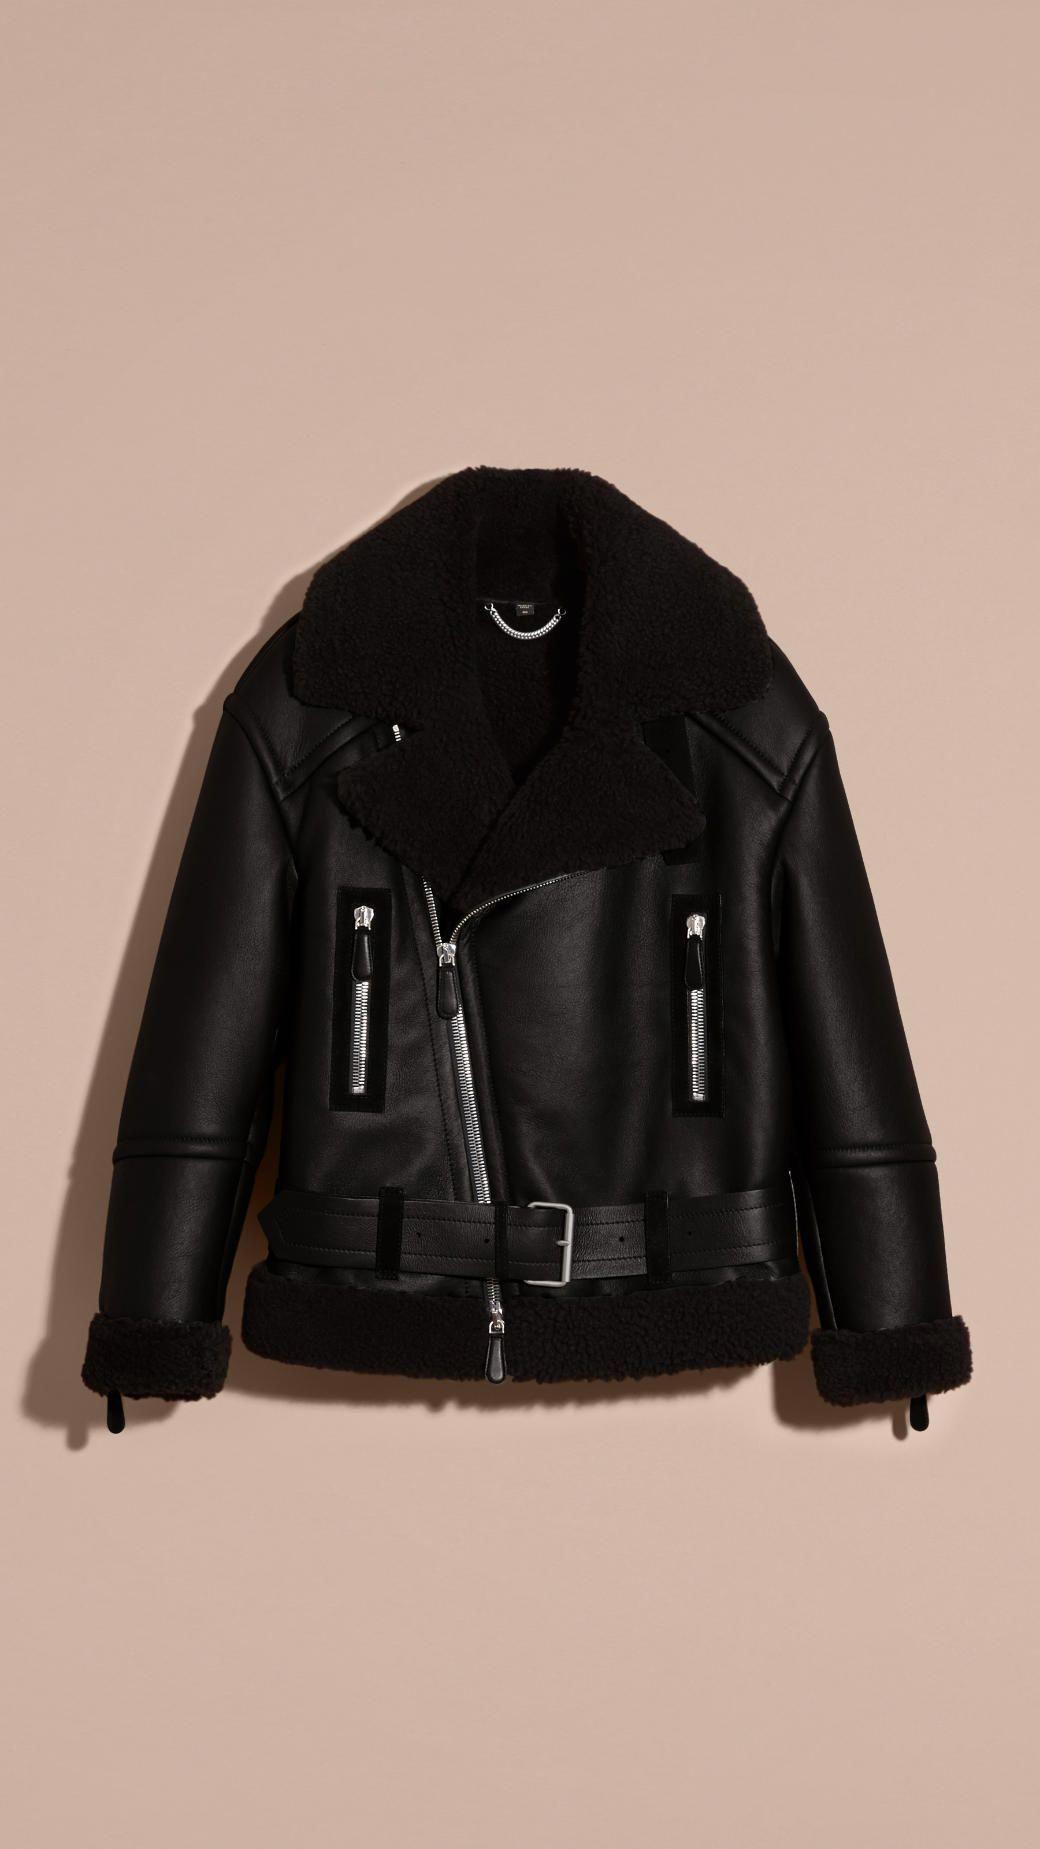 Oversize Shearling Flight Jacket   Burberry #MensFashionEdgy